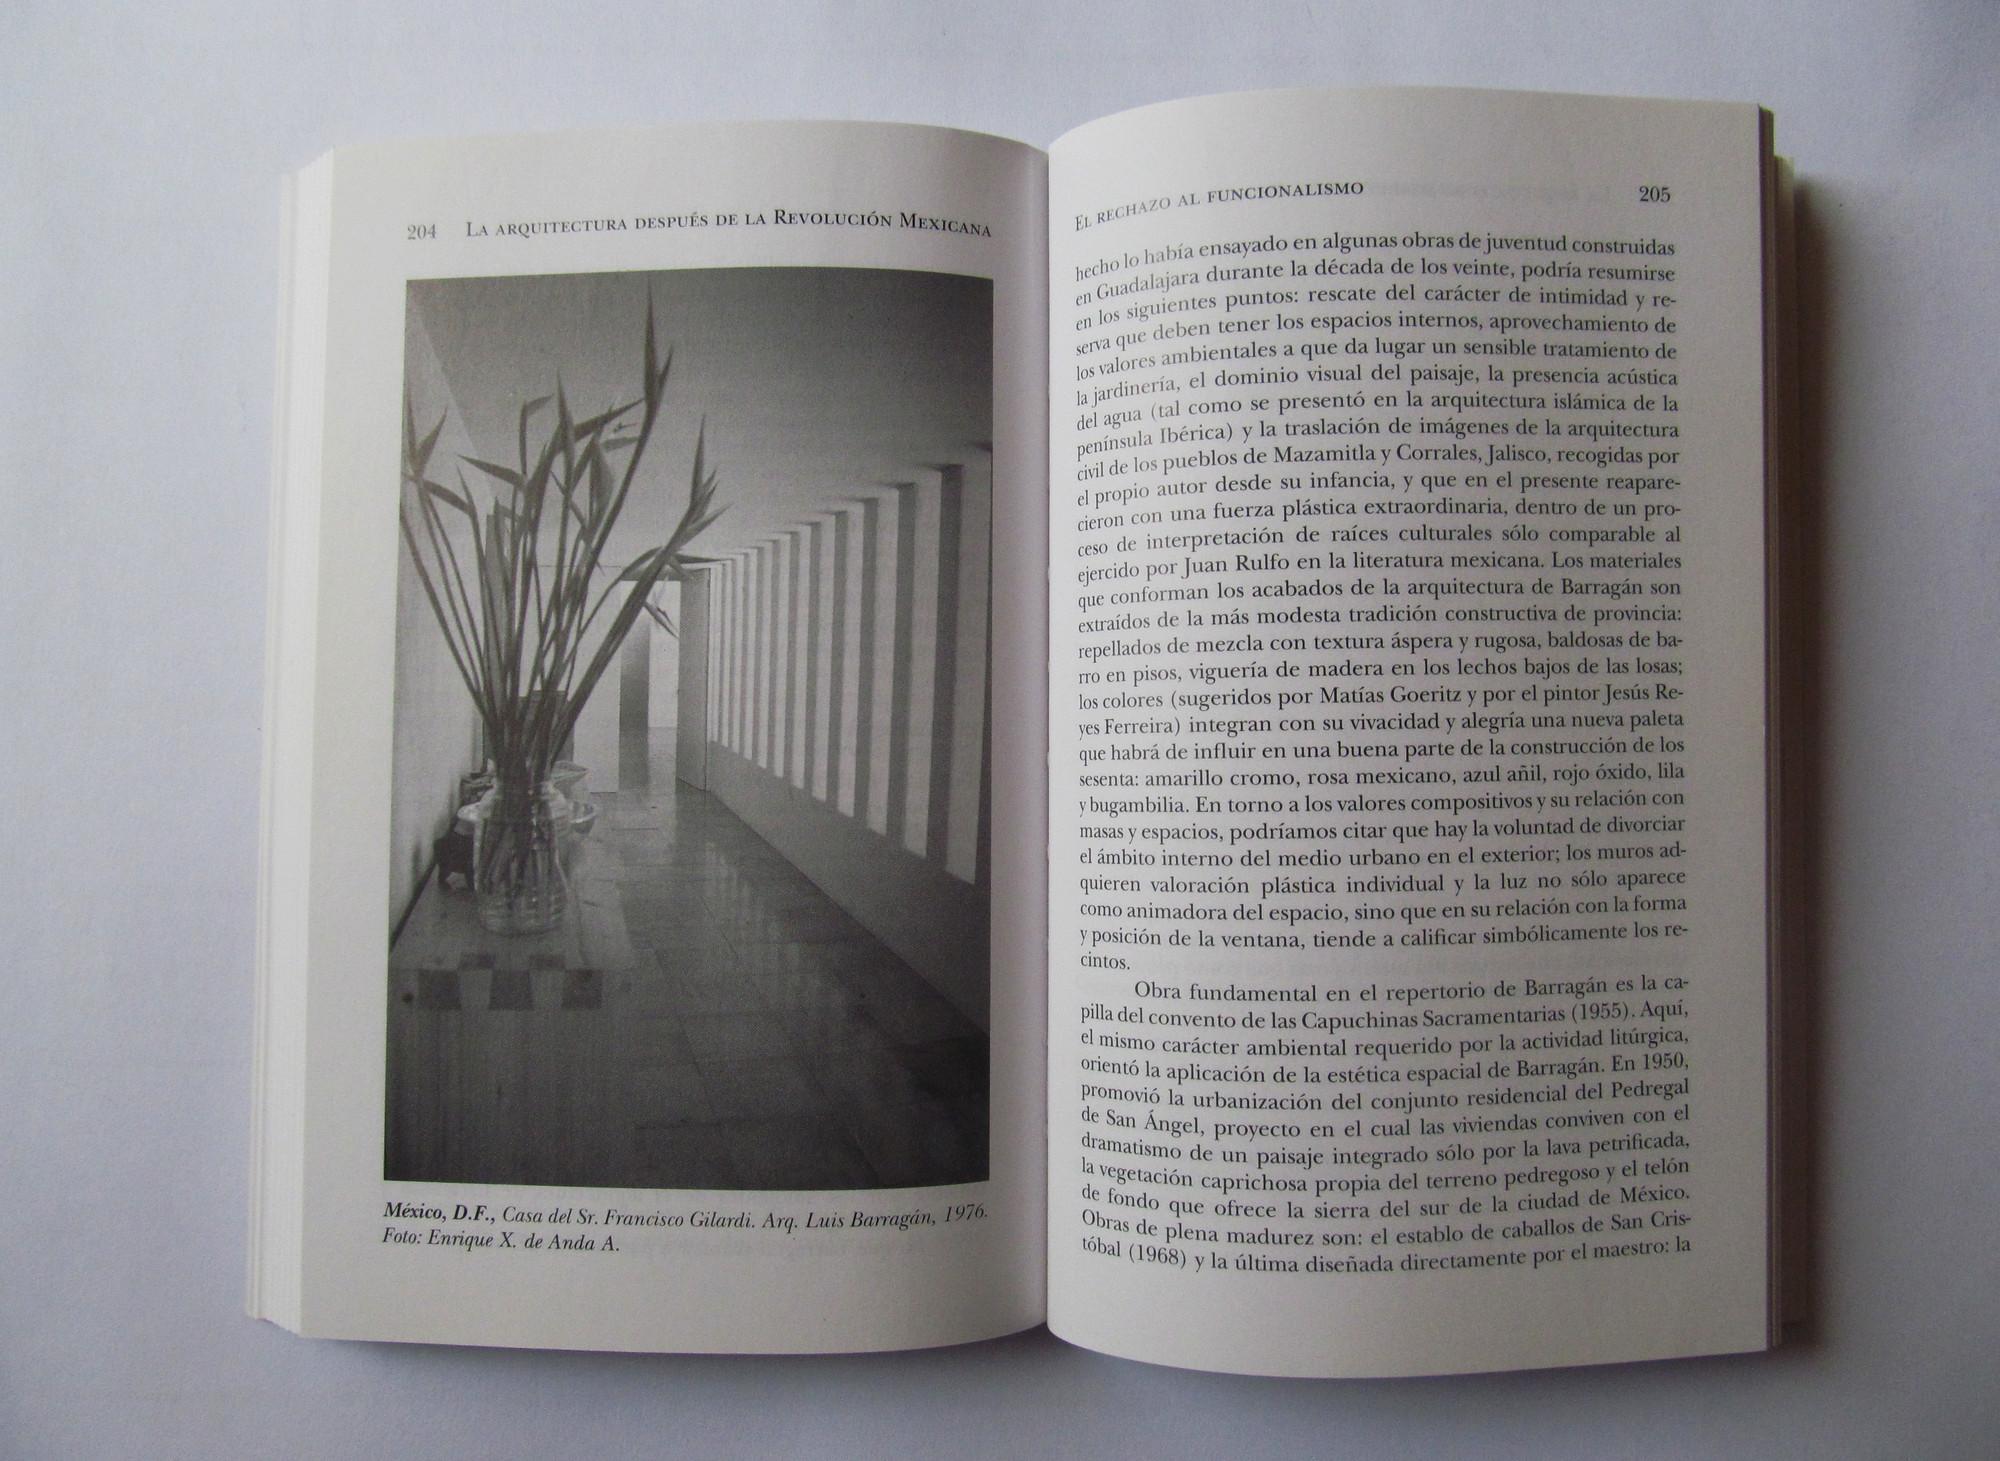 Historia de la arquitectura mexicana enrique x de anda